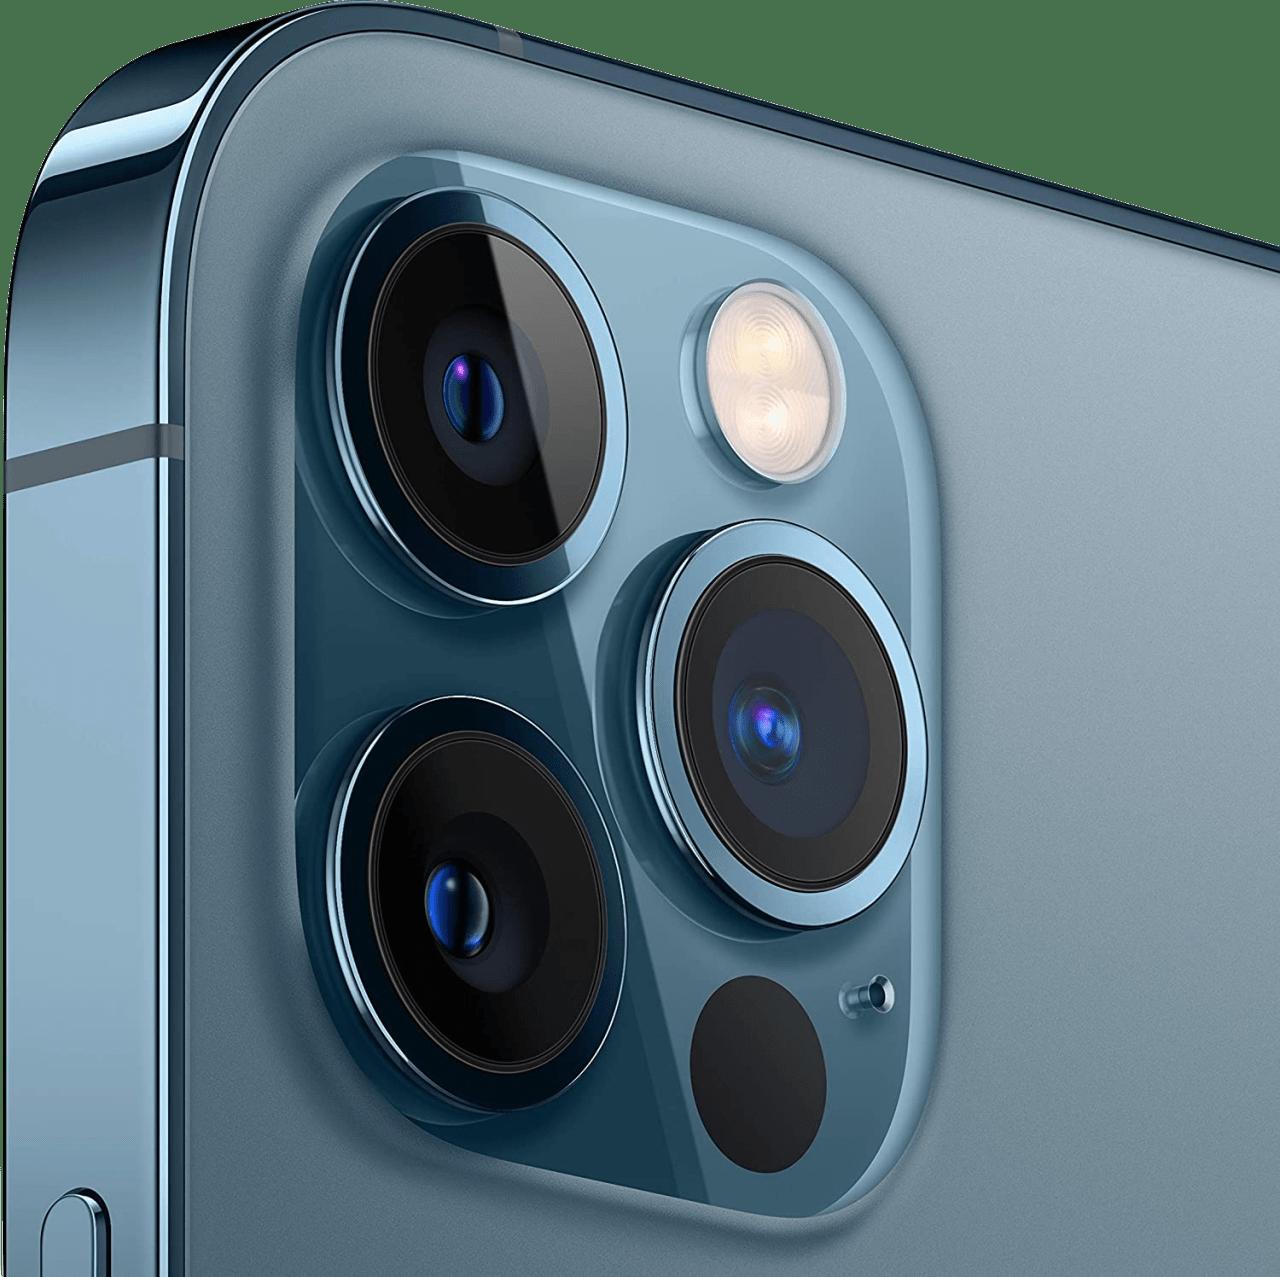 Pacific Blue Apple iPhone 12 Pro 256GB.4